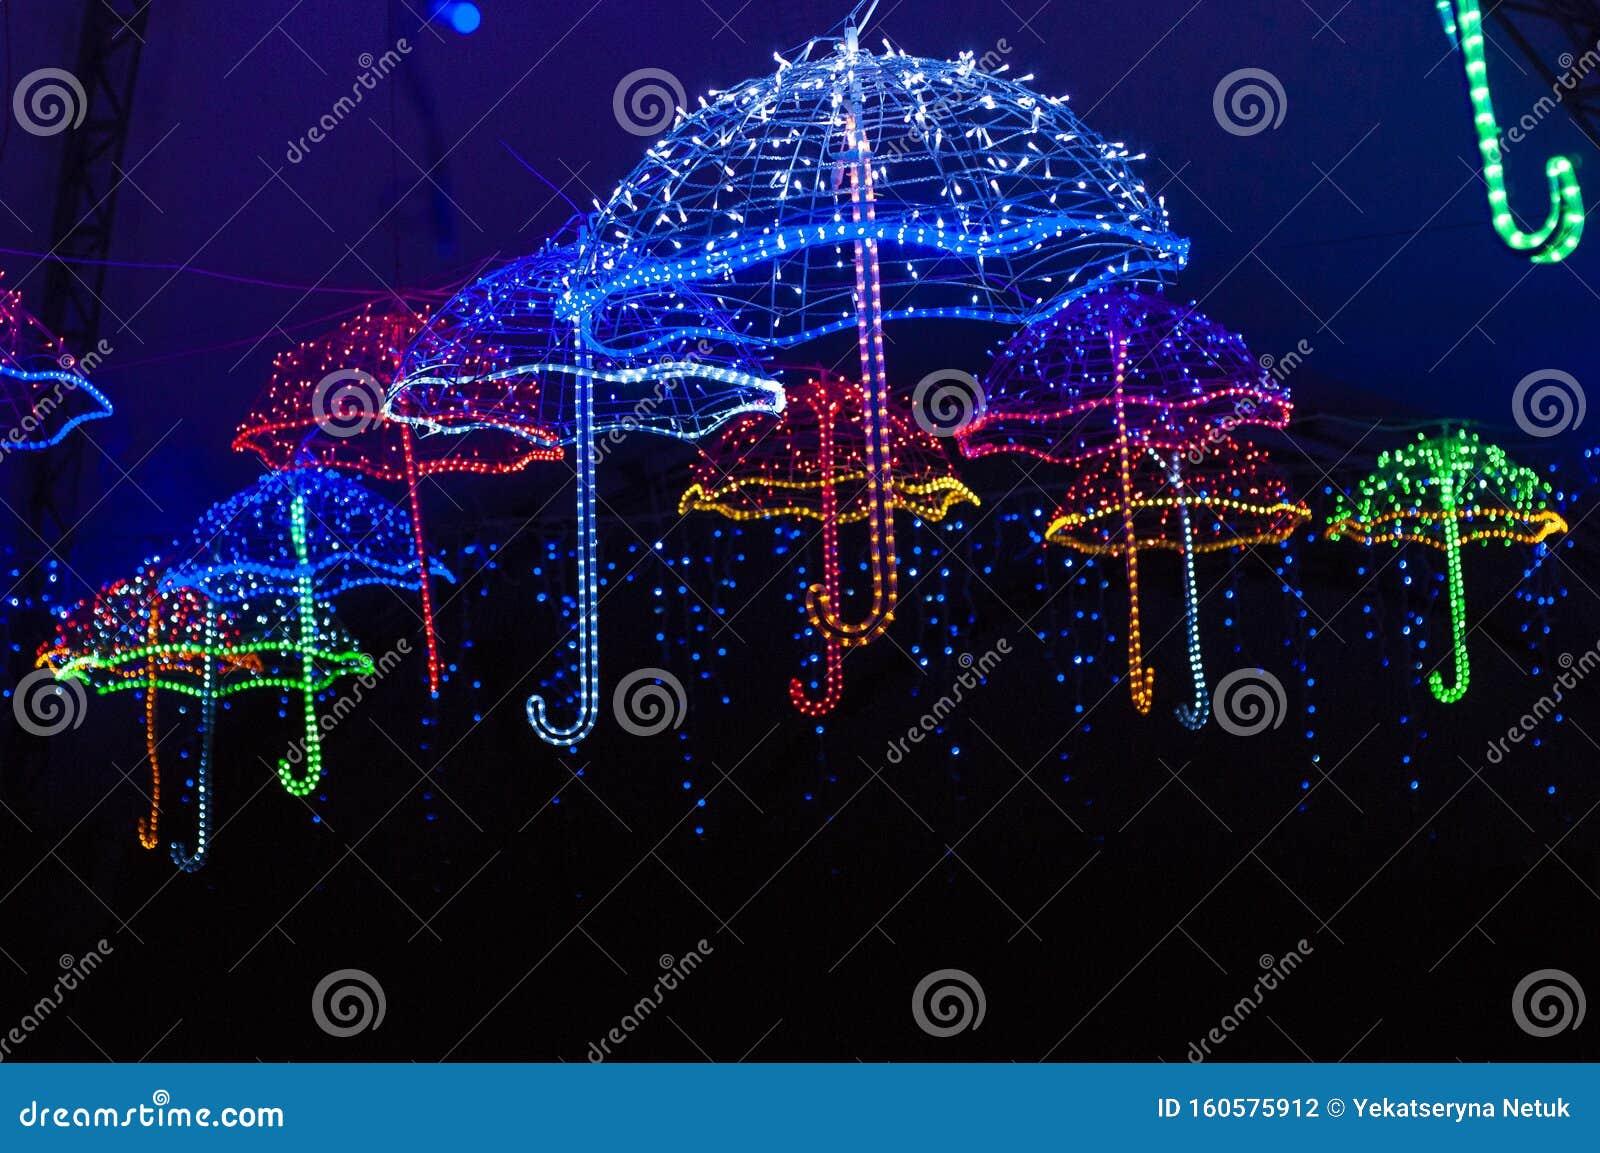 Christmas Light Decorations Glowing Umbrella Stock Photo Image Of Illumination City 160575912